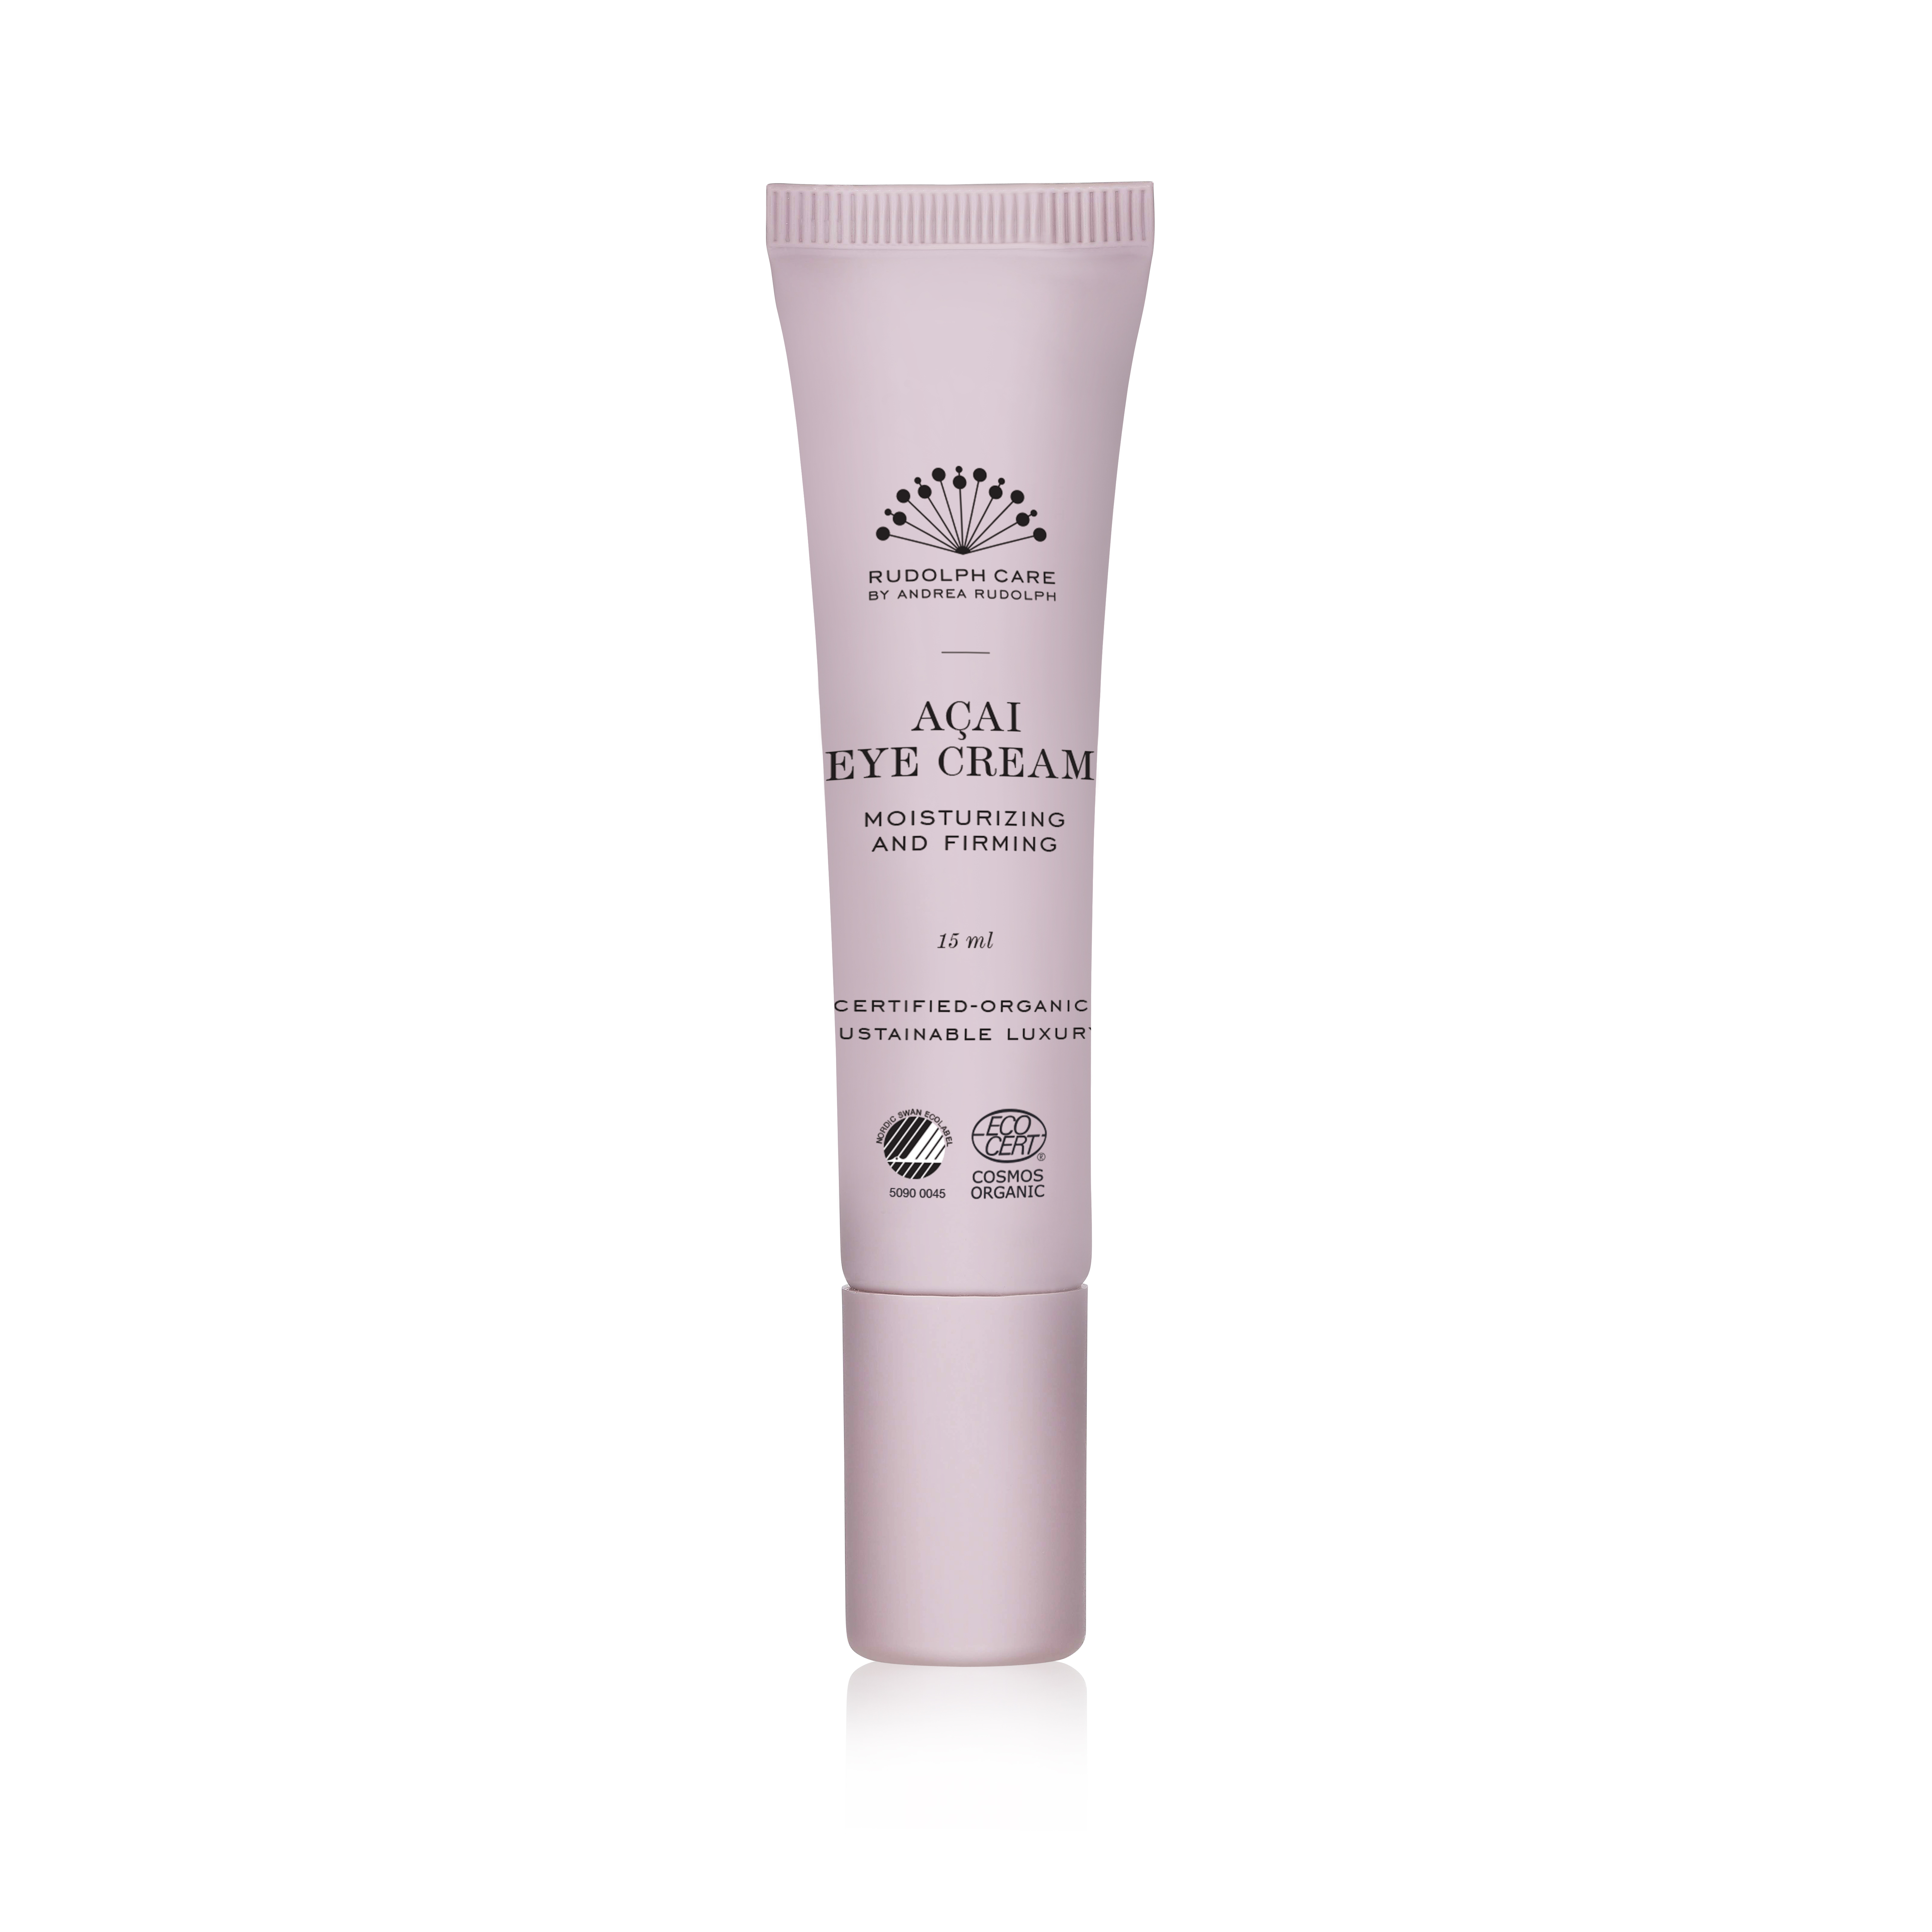 Rudolph Care Acai Eye Cream, 15 ml